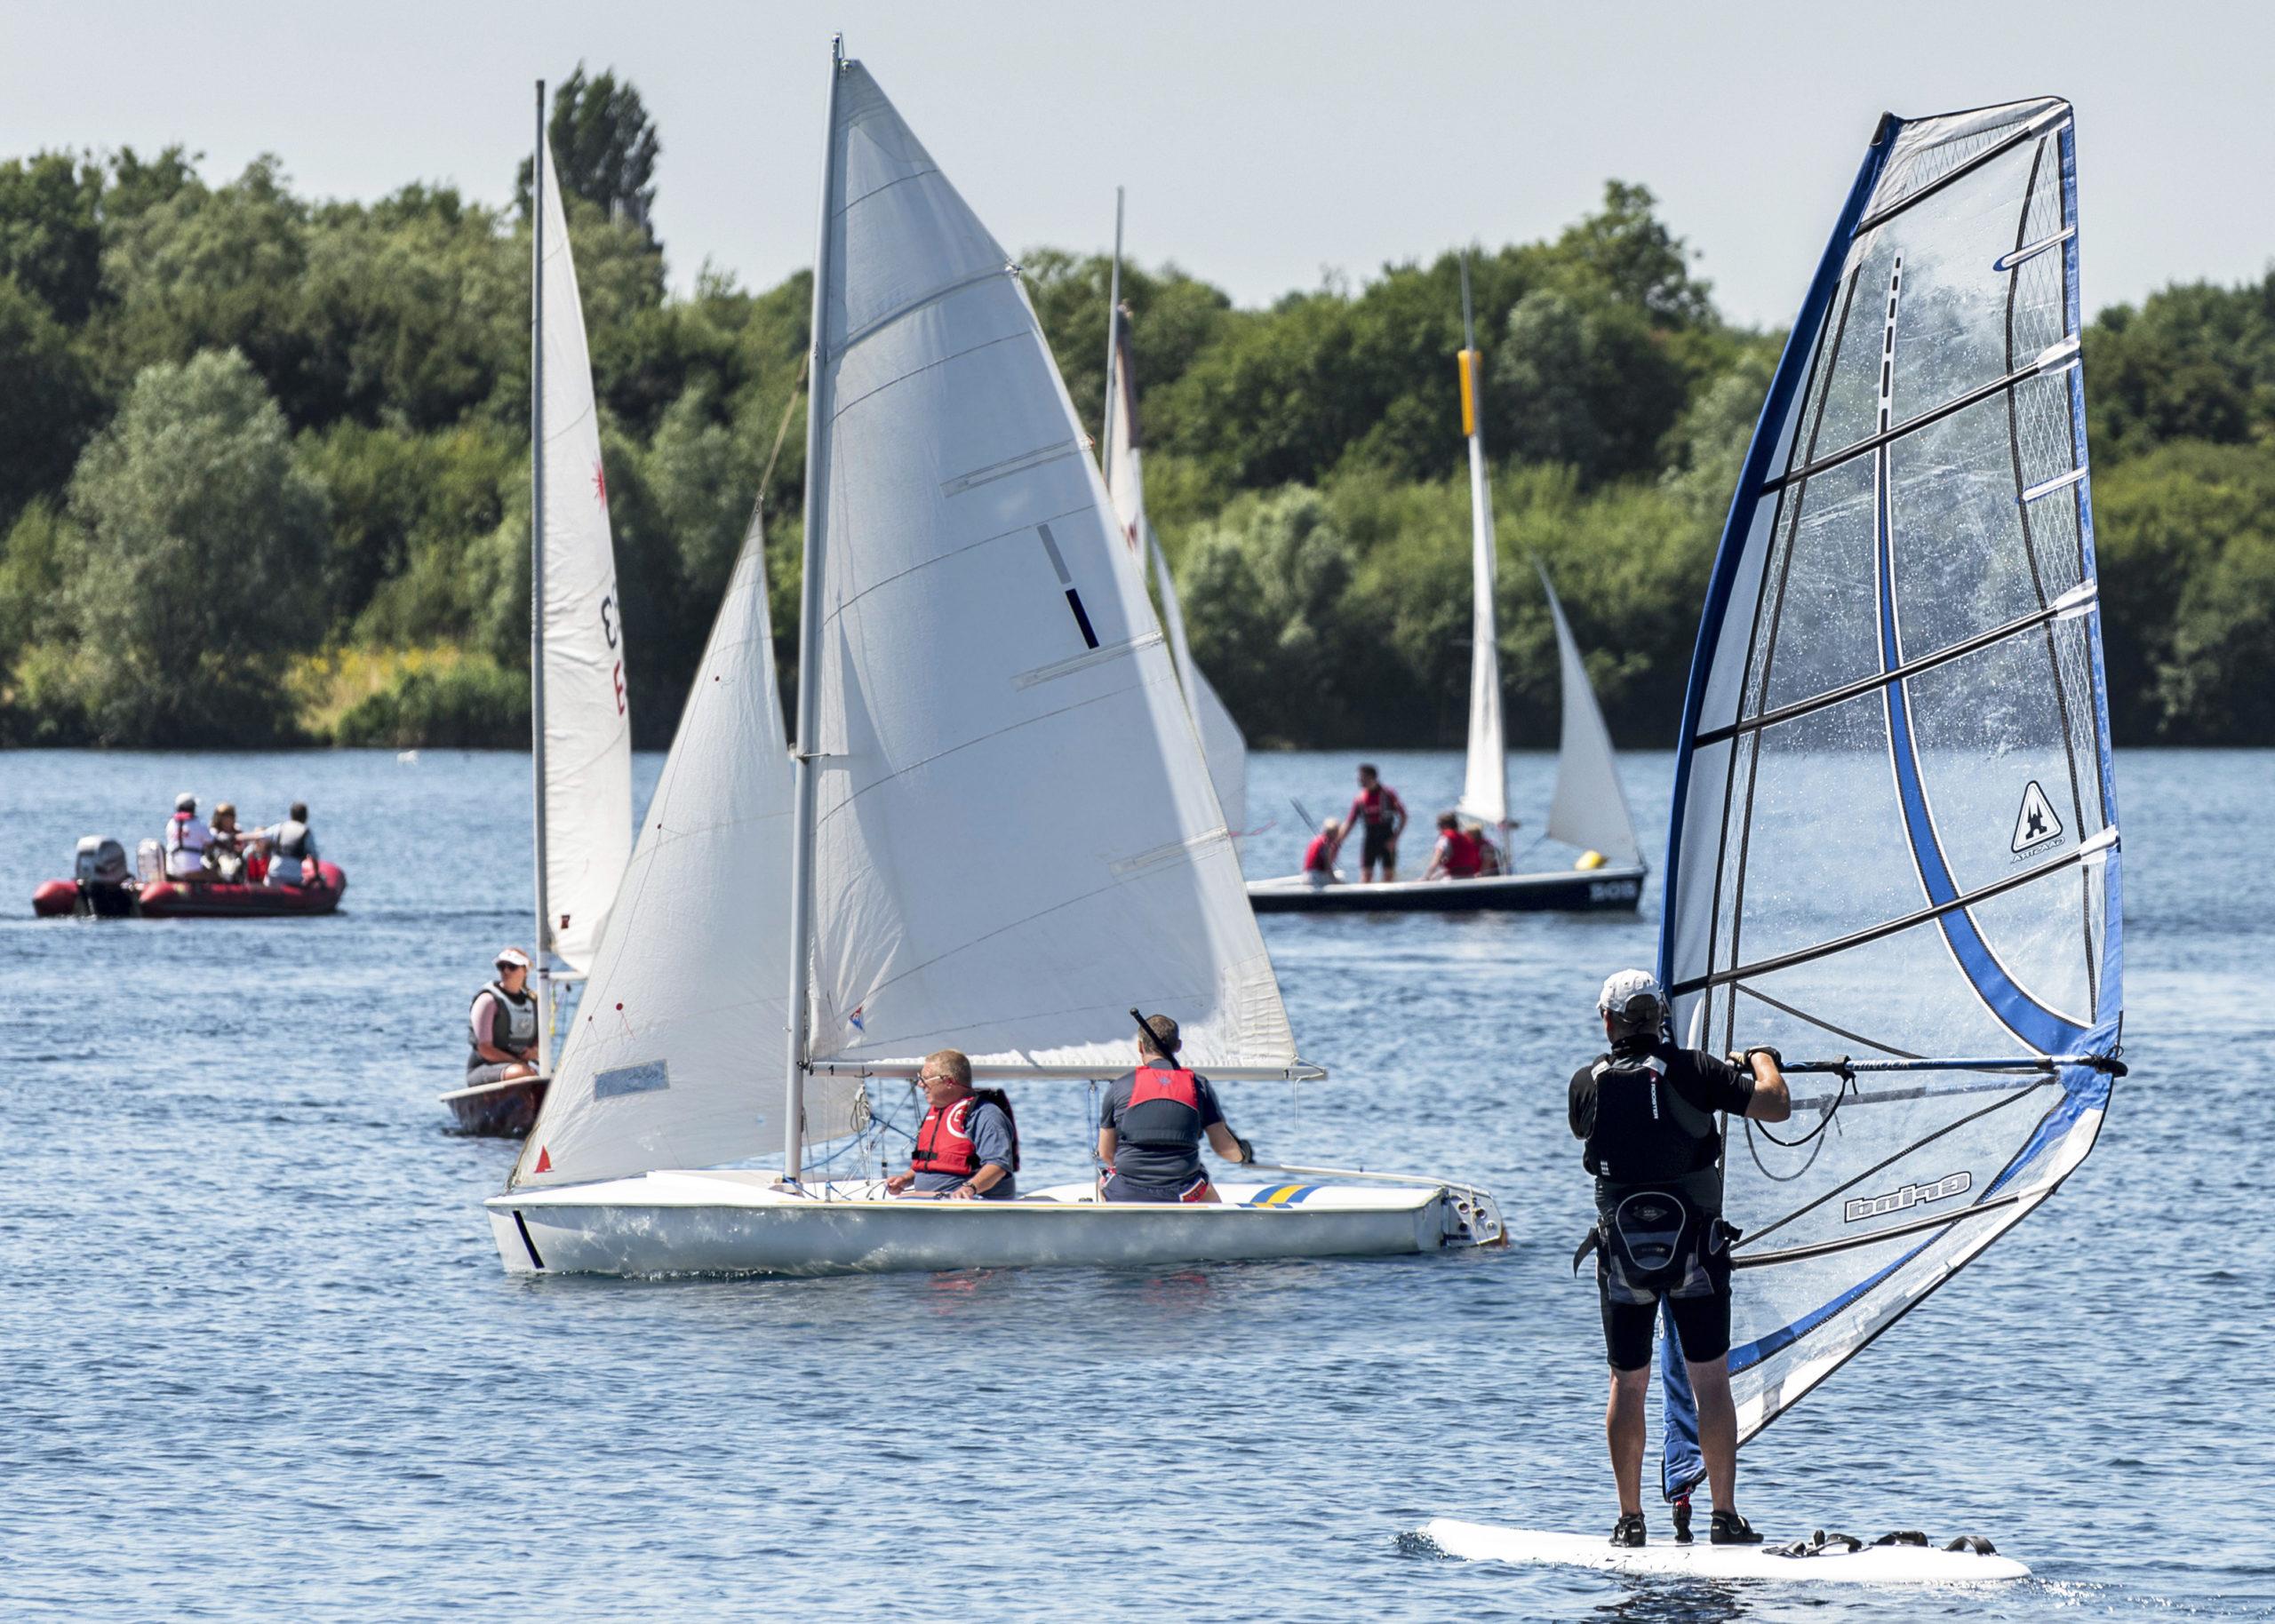 Credit - South Cerney Sailing Club